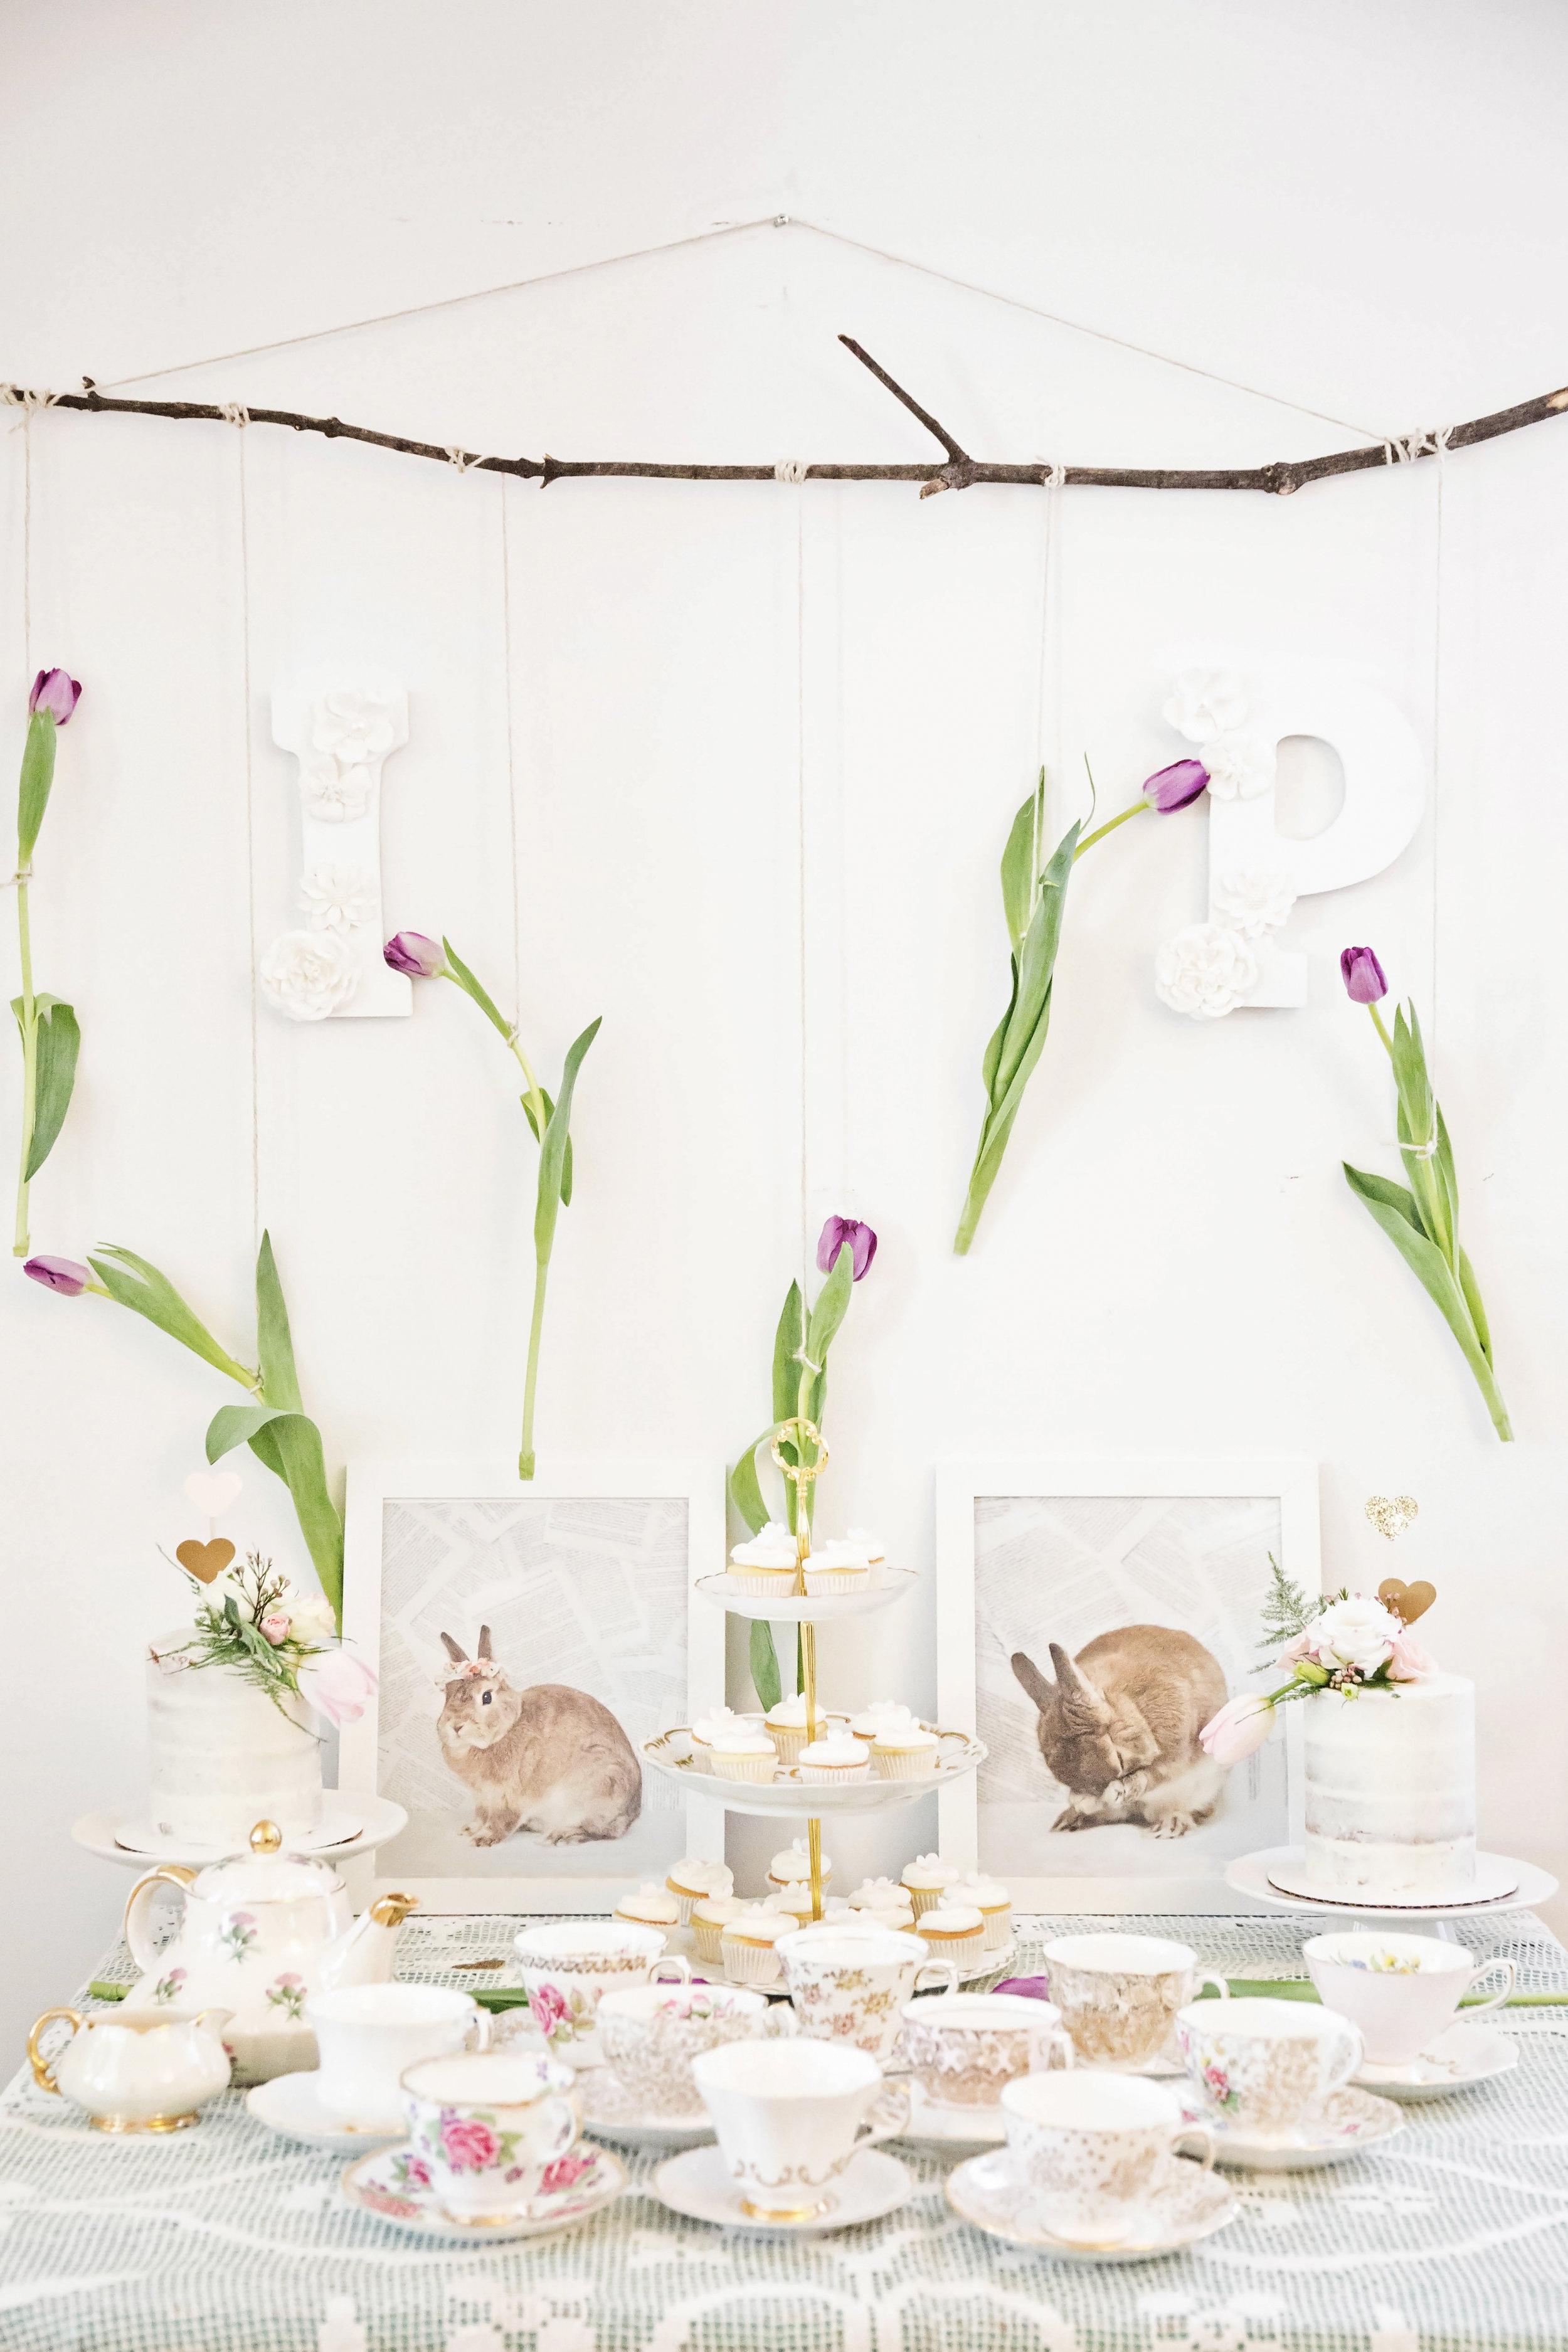 toronto-branding-photographer-baby-shower-ideas-13.jpg